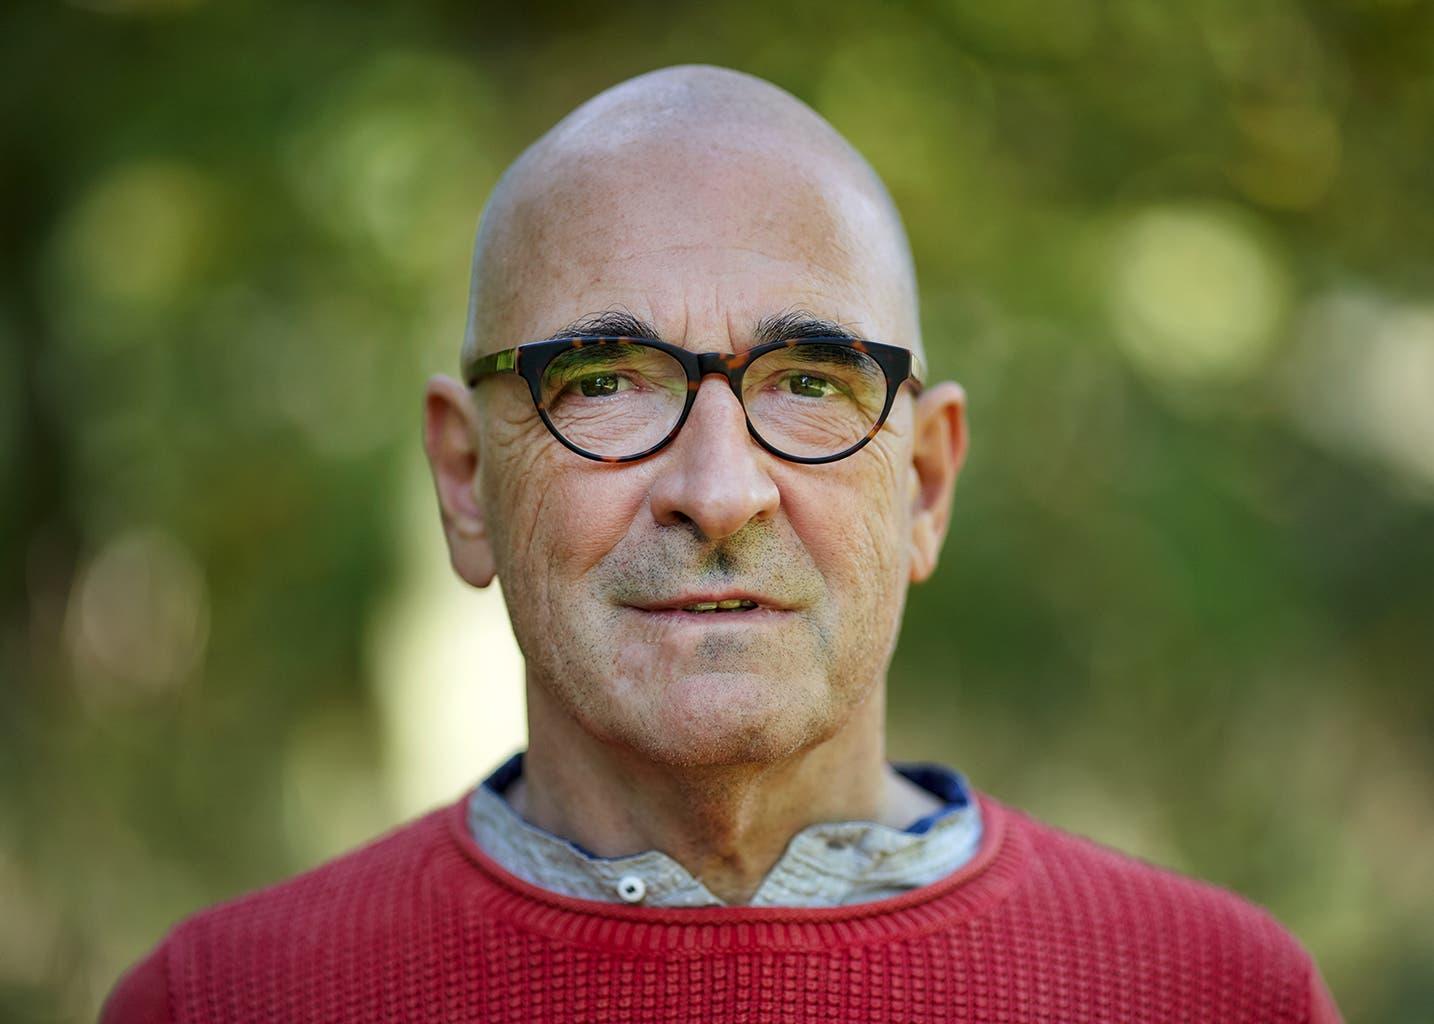 Vilas Turske, Lehrer für Pranayama-Yoga